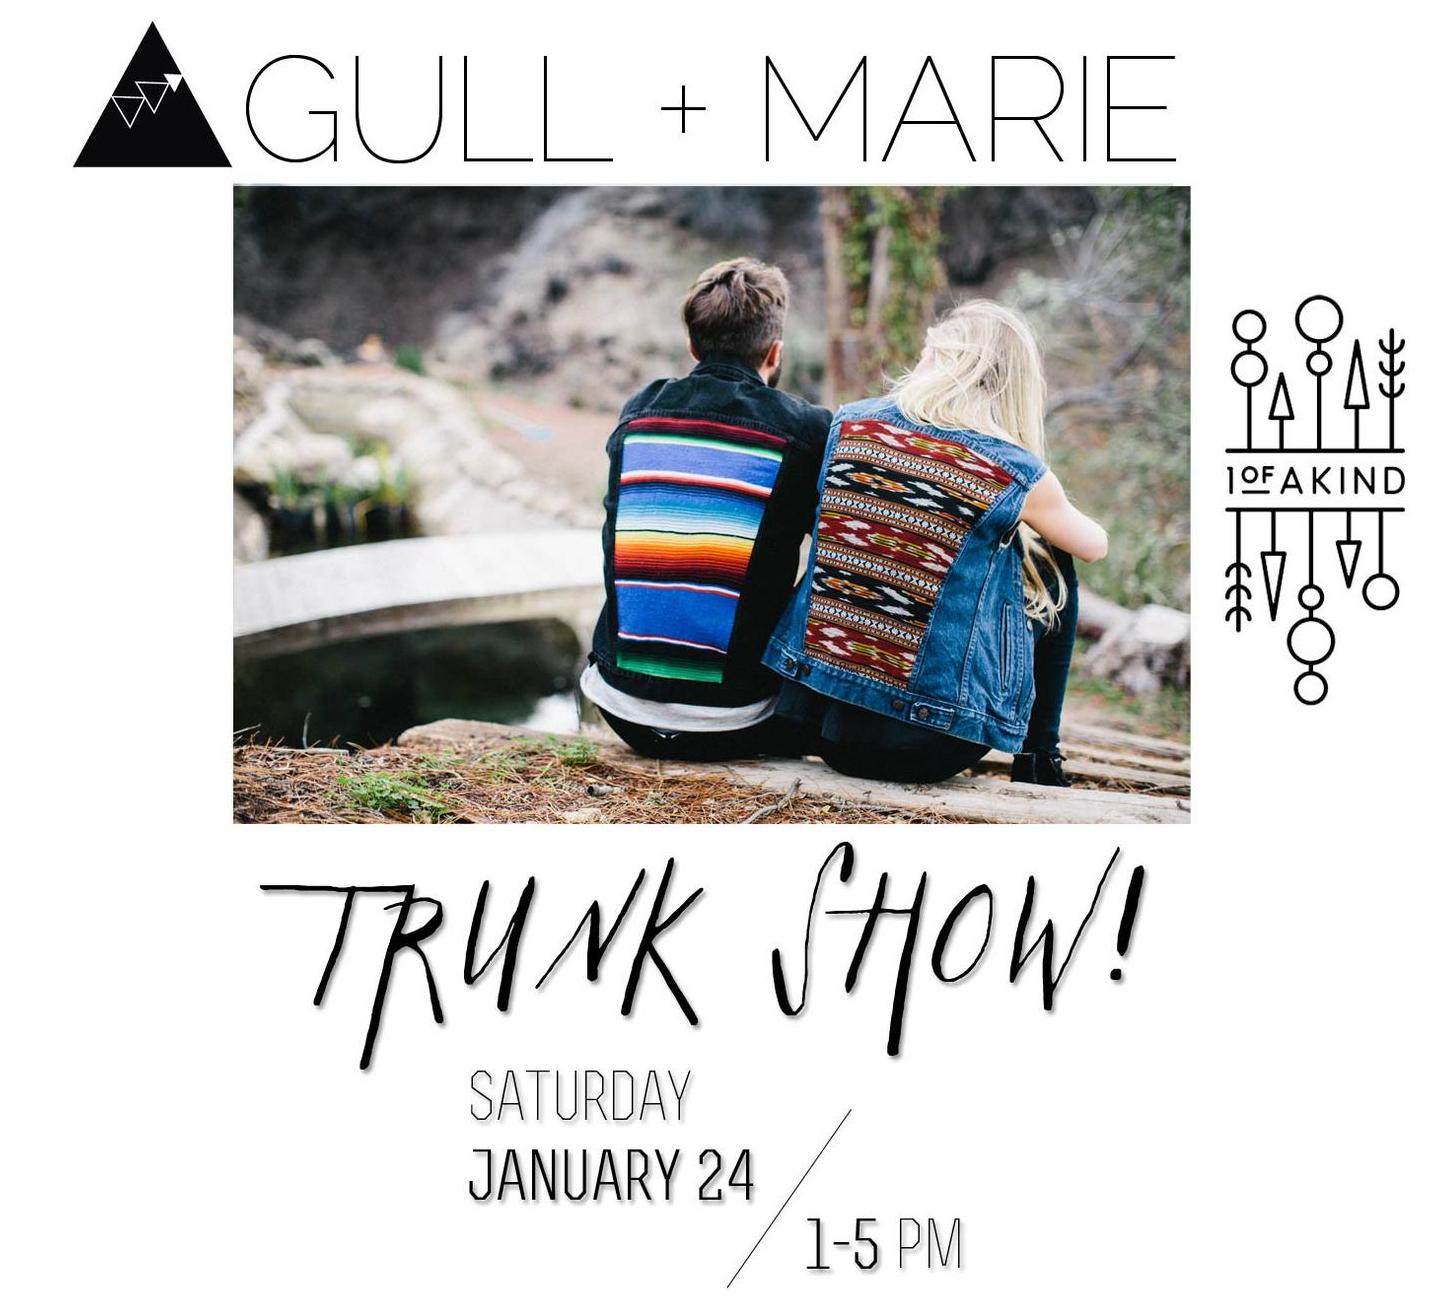 GM Trunk Show.jpg